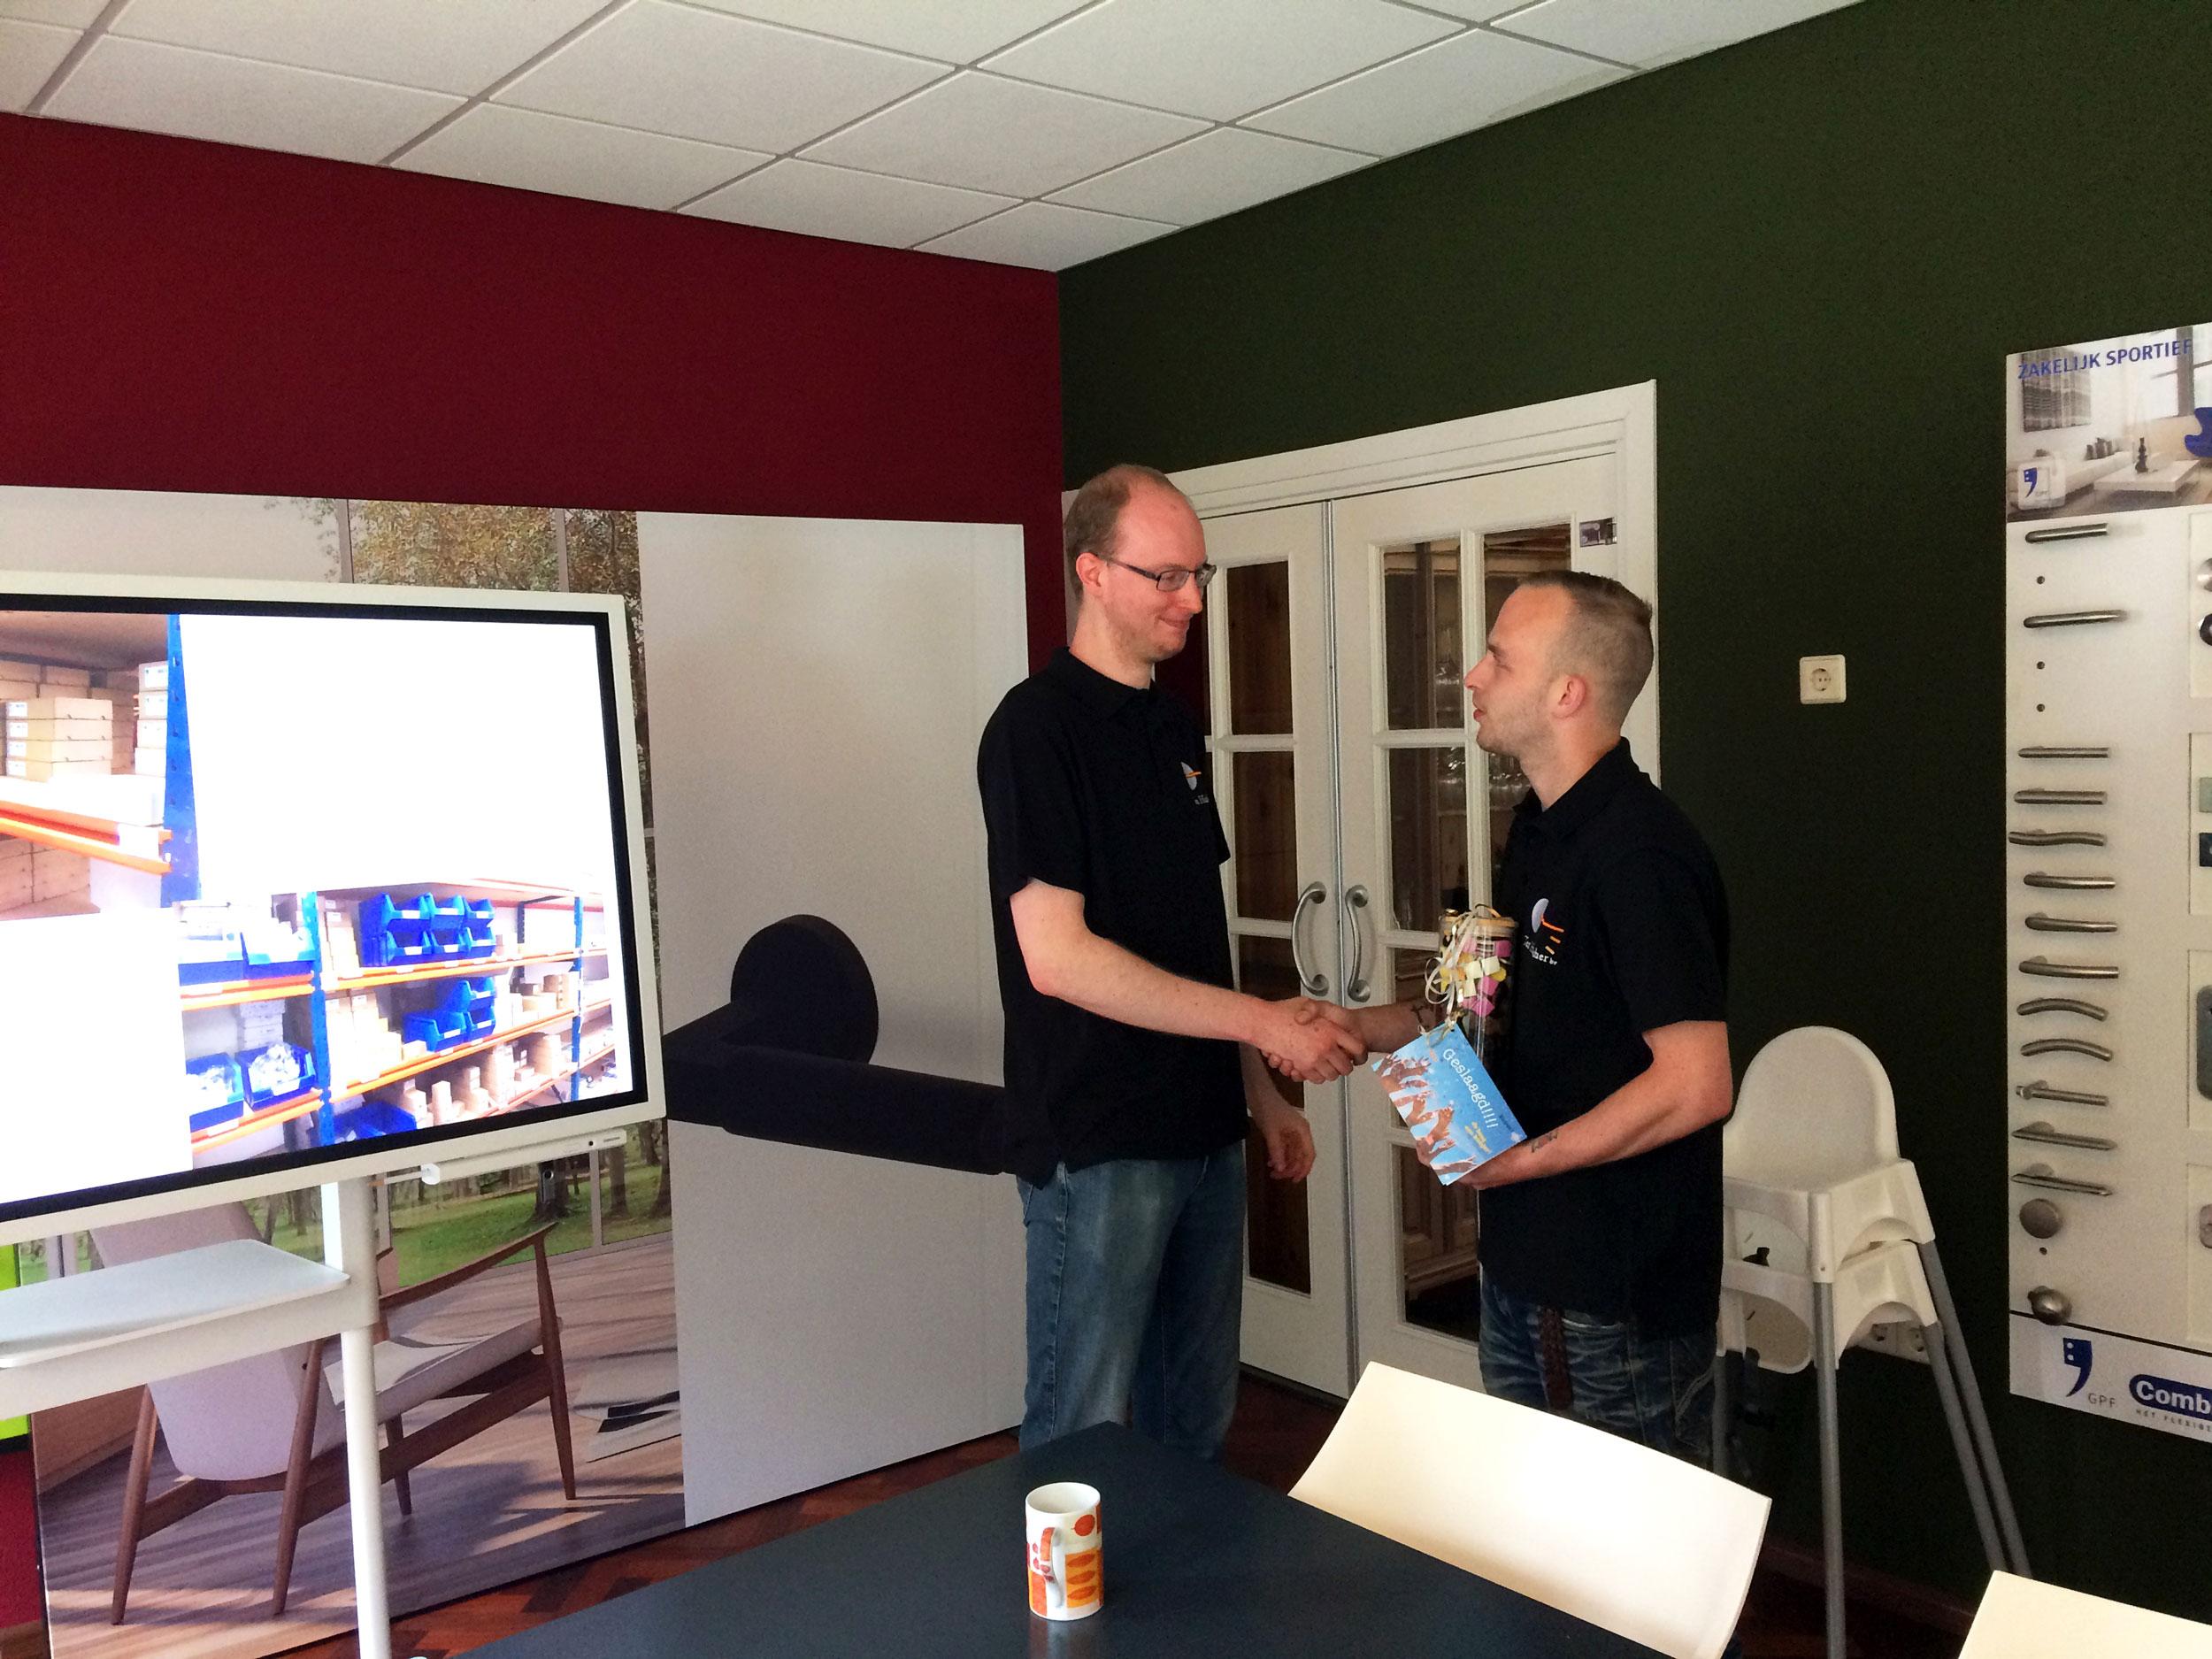 Teamlid Joost is geslaagd als Logistiek Supervisor!